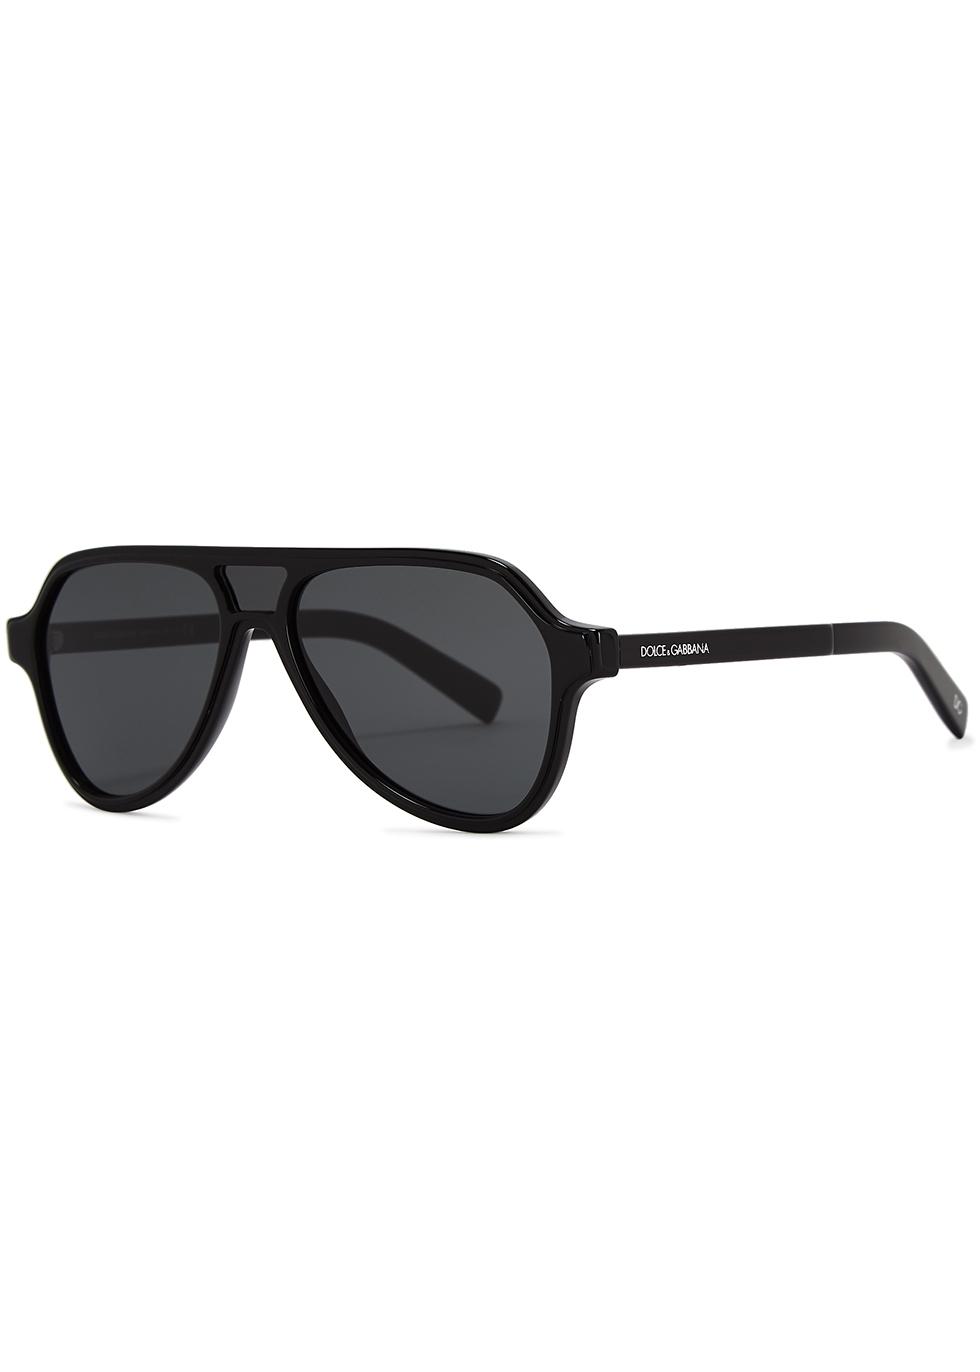 966d6486cc61 Men's Designer Sunglasses & Eyewear - Harvey Nichols